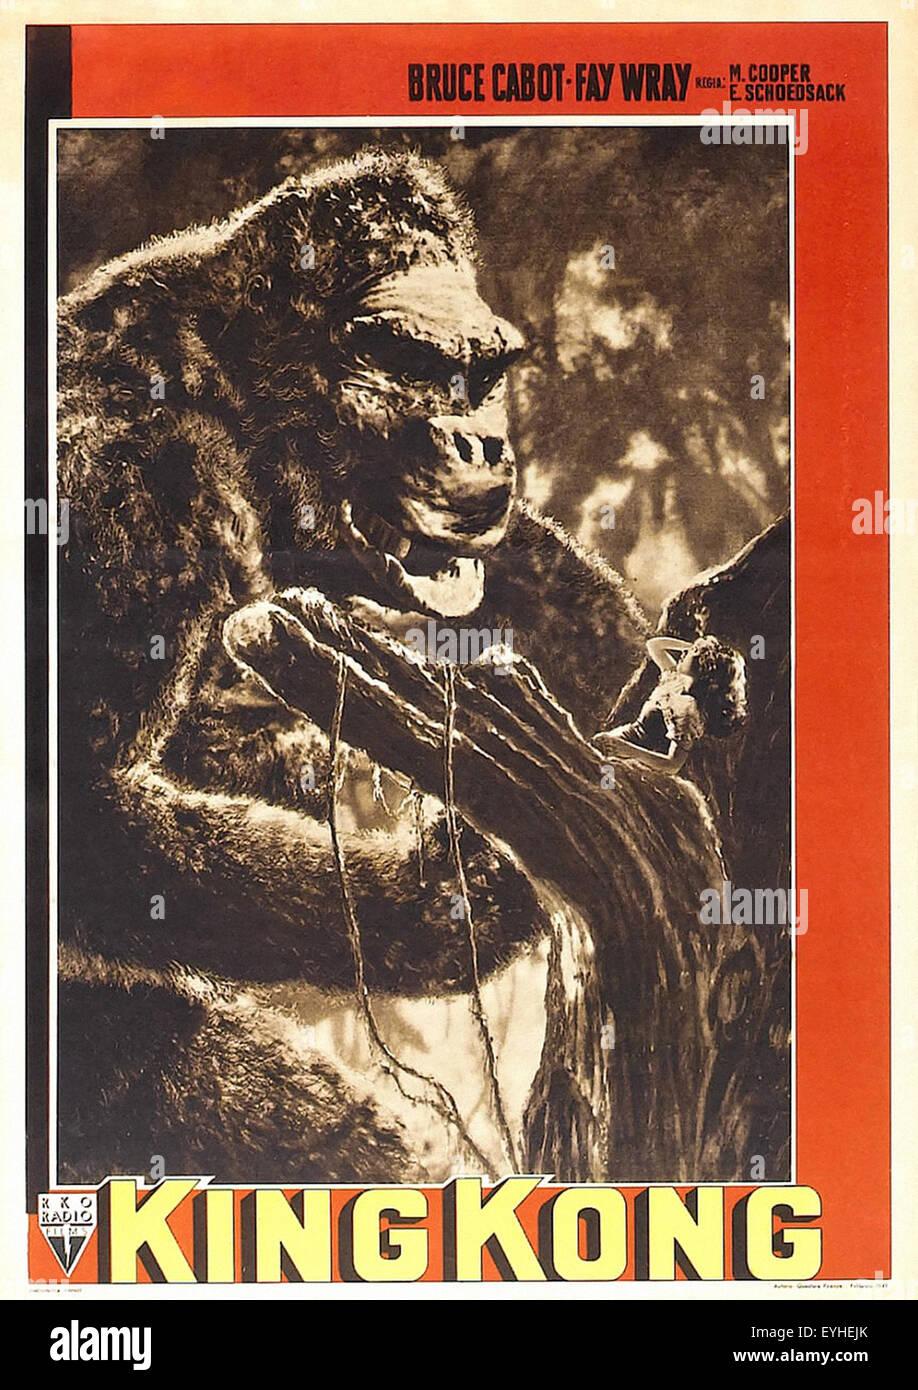 King Kong 1933 Movie Poster Stock Photo 85821867 Alamy